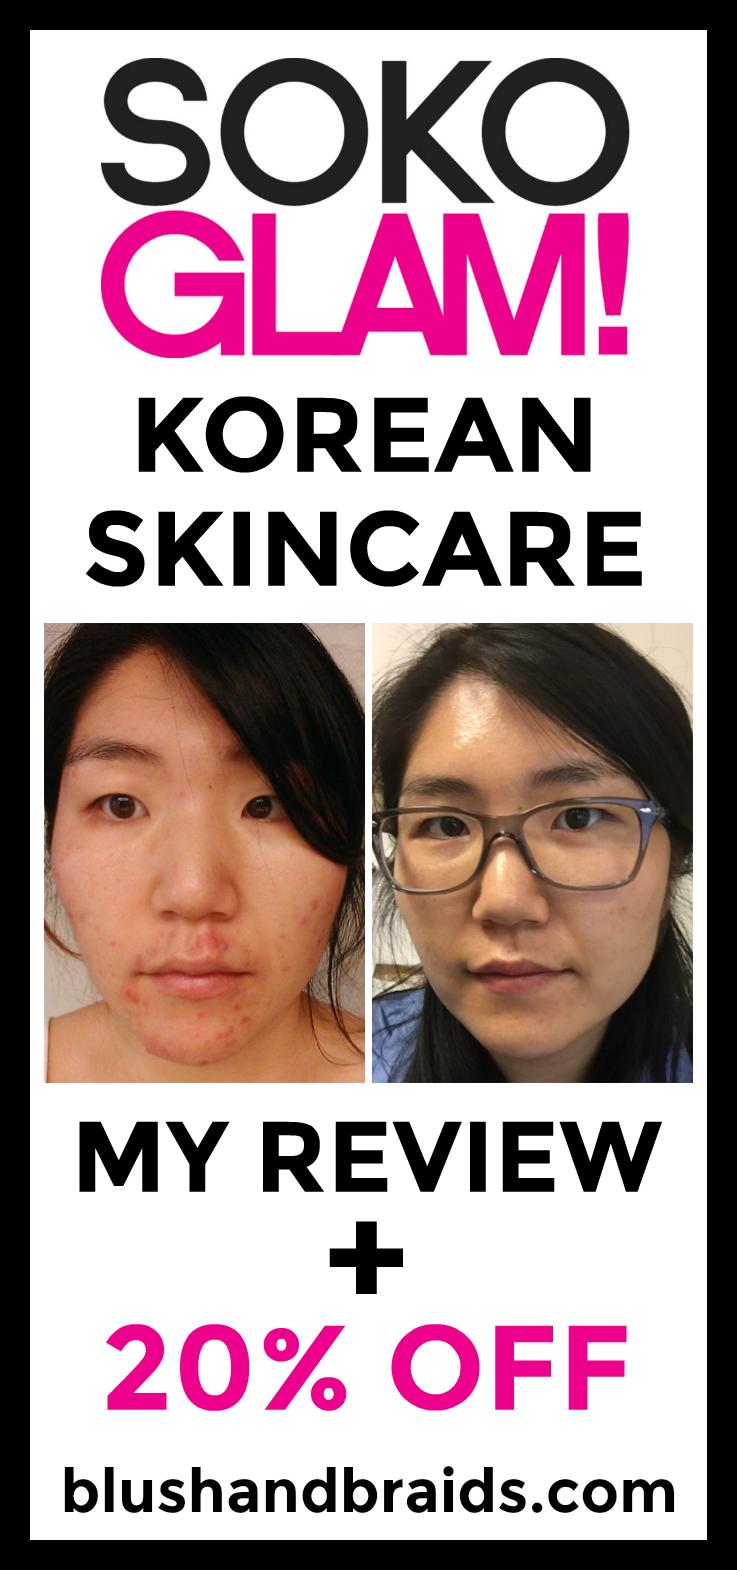 Soko Glam Soko Glam Korean Skincare Routine Soko Glam 10 Step Soko Glam Skin Care Soko Glam Skin Care Korean Skincare Soko Glam Korean Skincare Routine